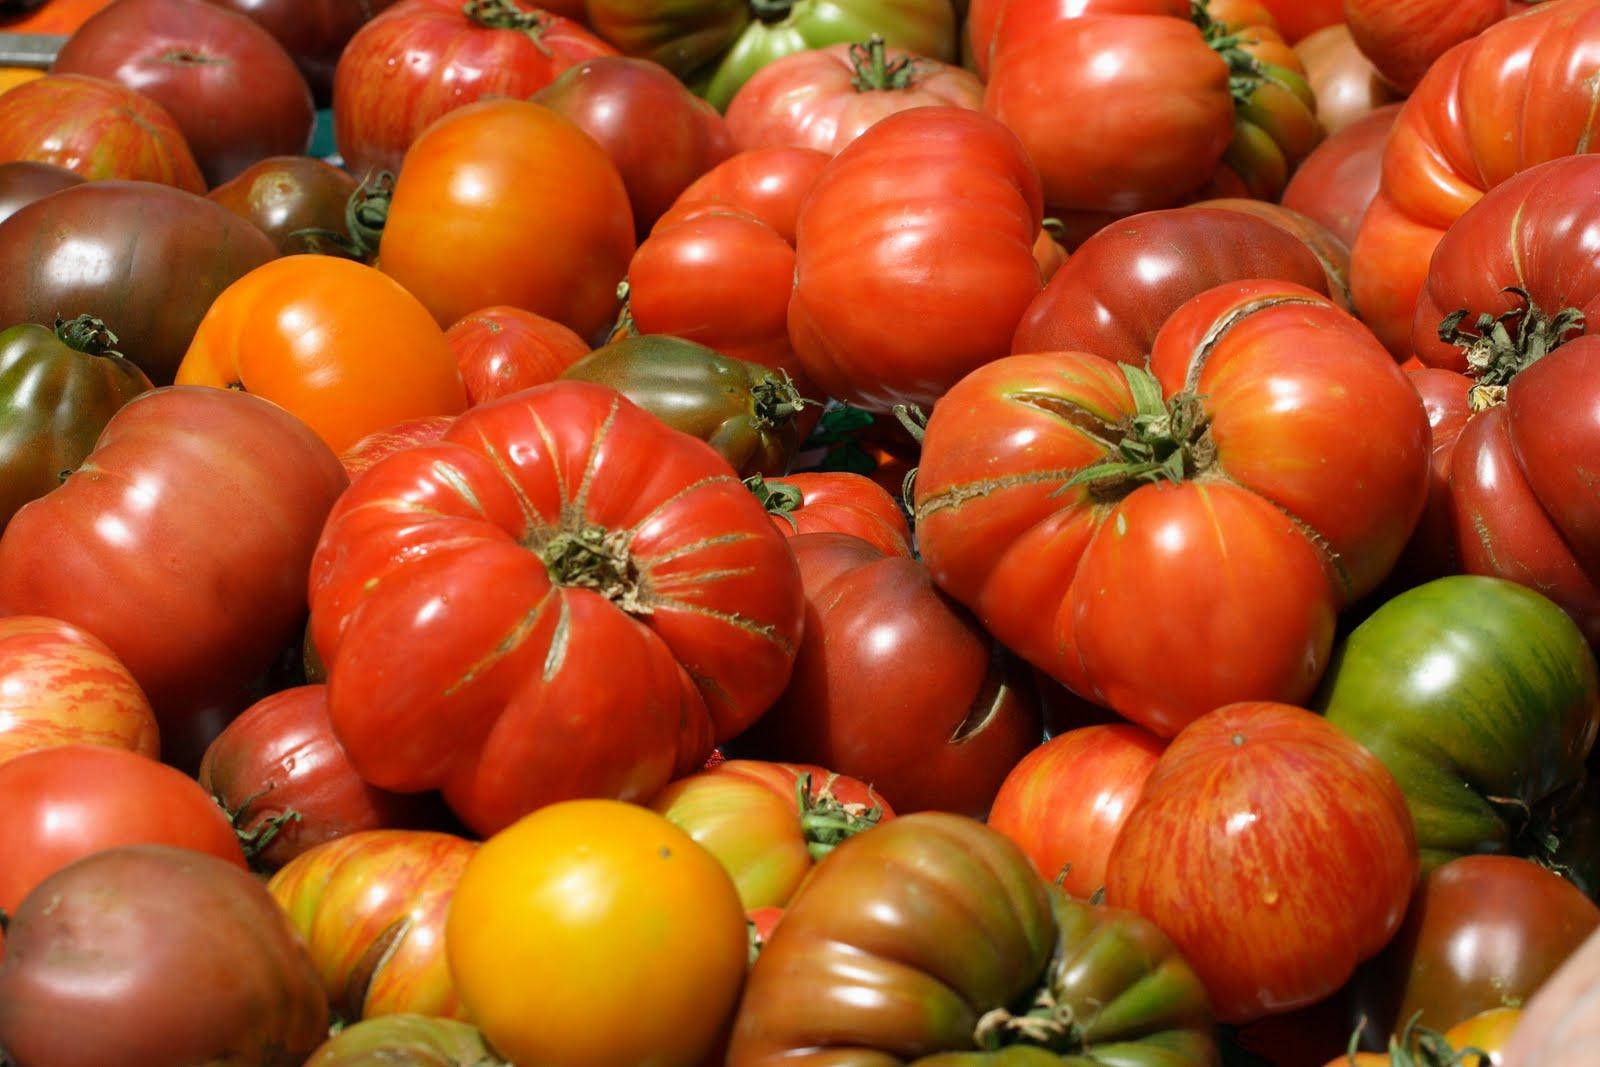 Organic Large Heirloom Tomatoes 3lb